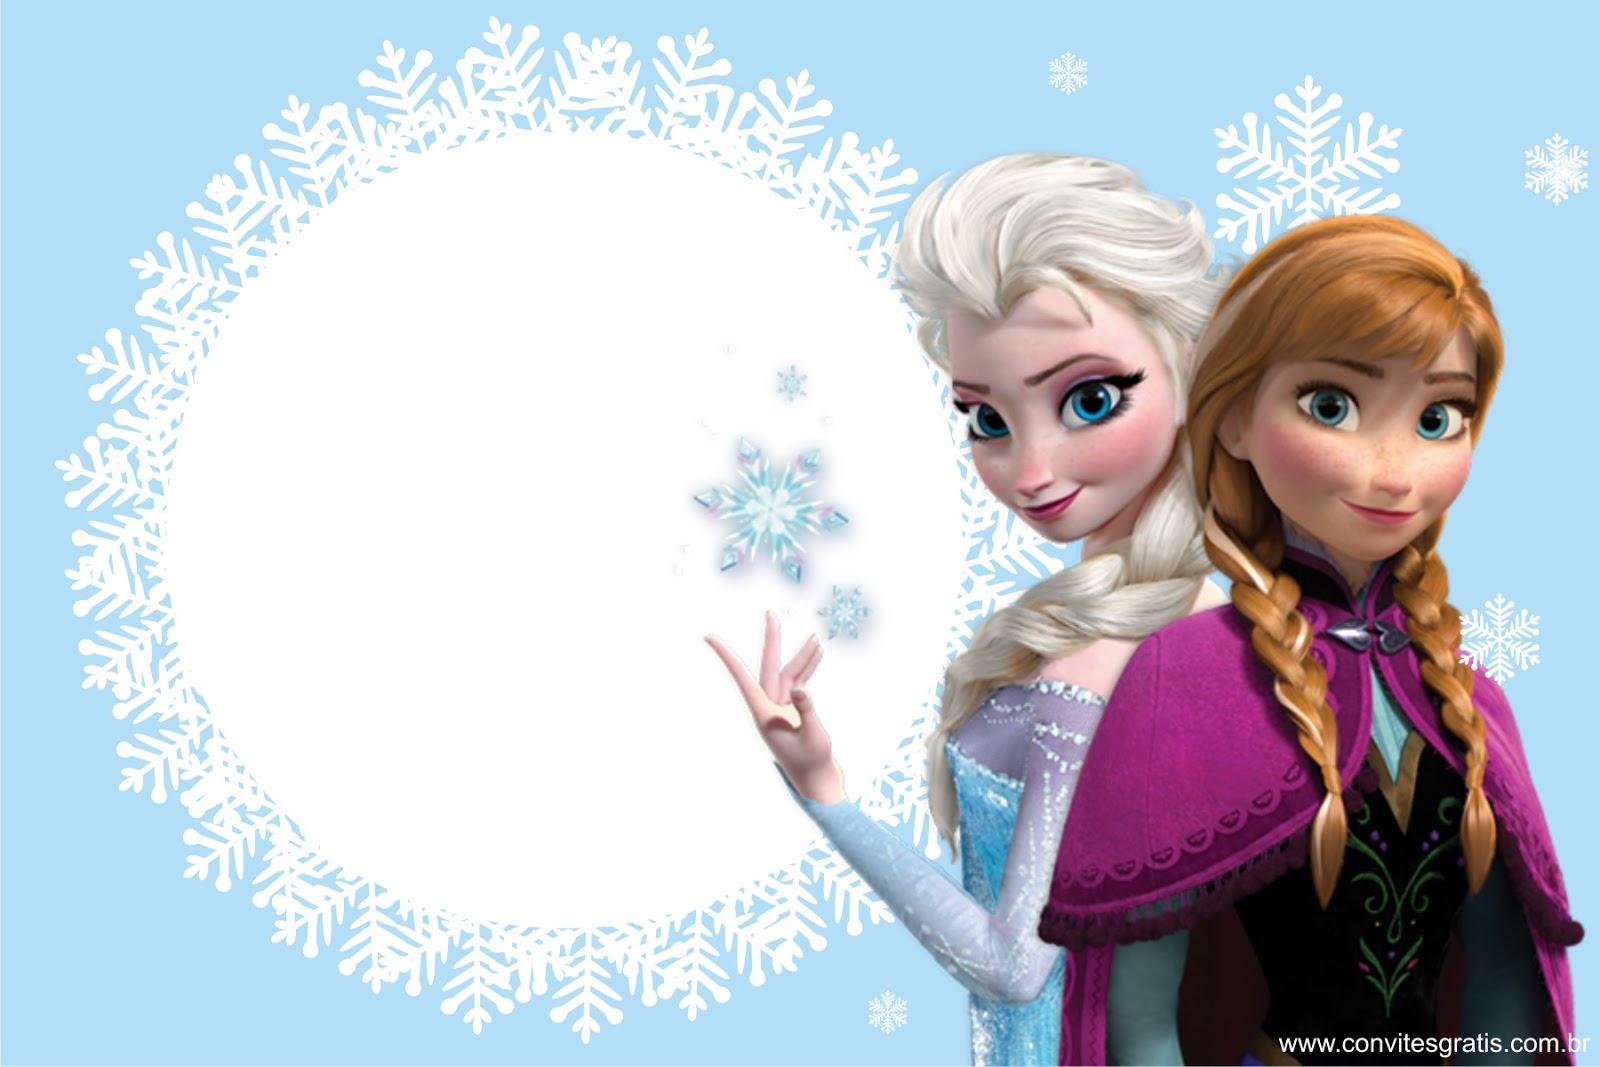 convite gratis para imprimir Frozen